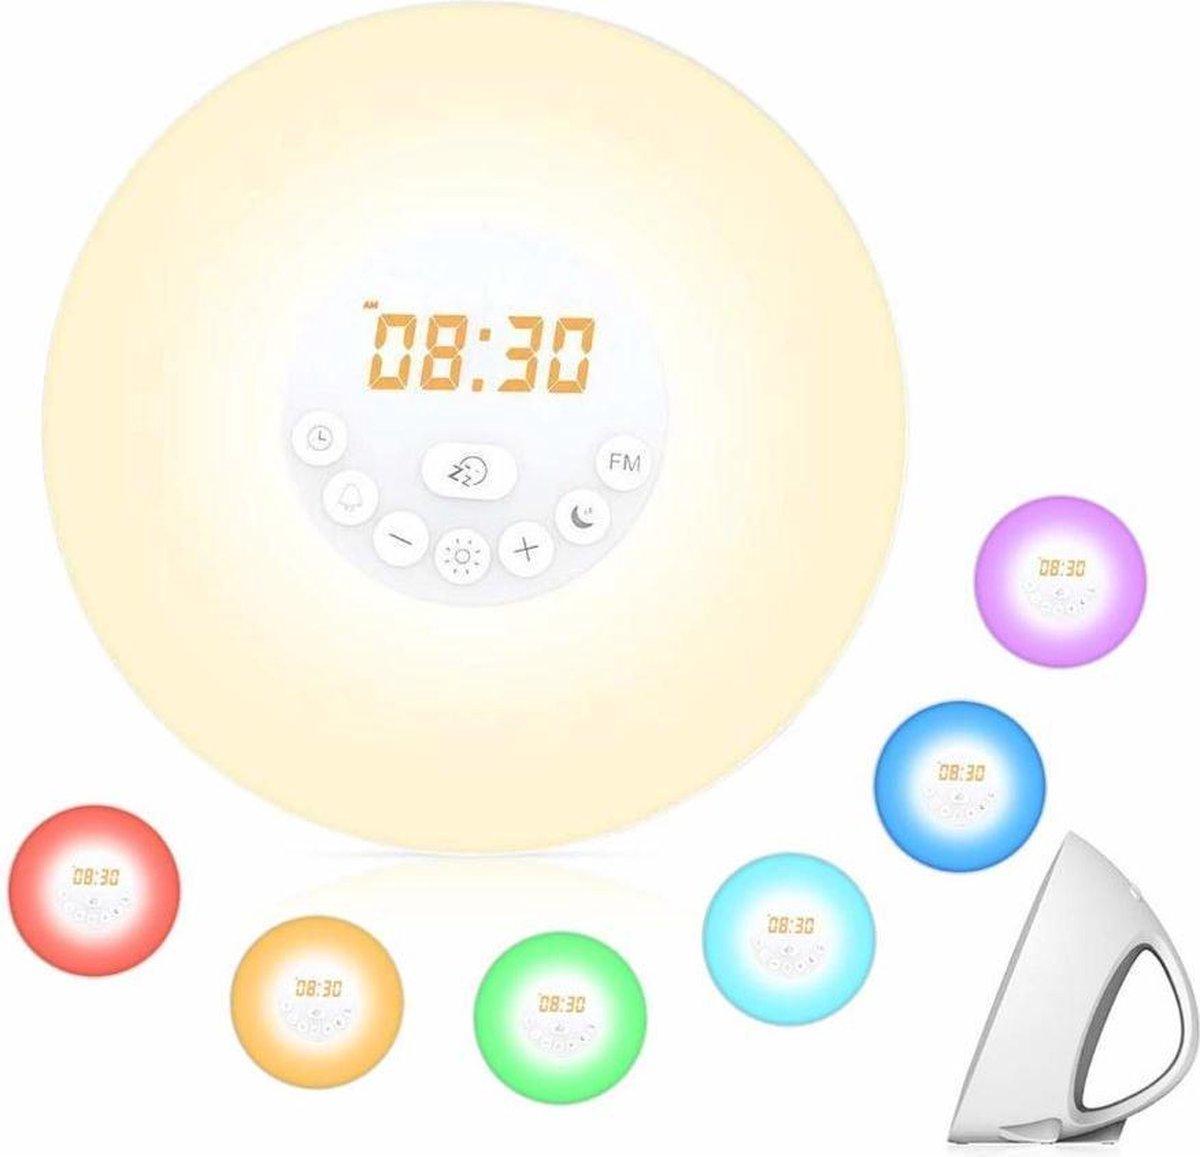 Wake up light | FM Radio | Alarm | Wekker | Snooze | 6 Verschillende Kleuren | Multi Kleur | 10 lichtinstellingen |